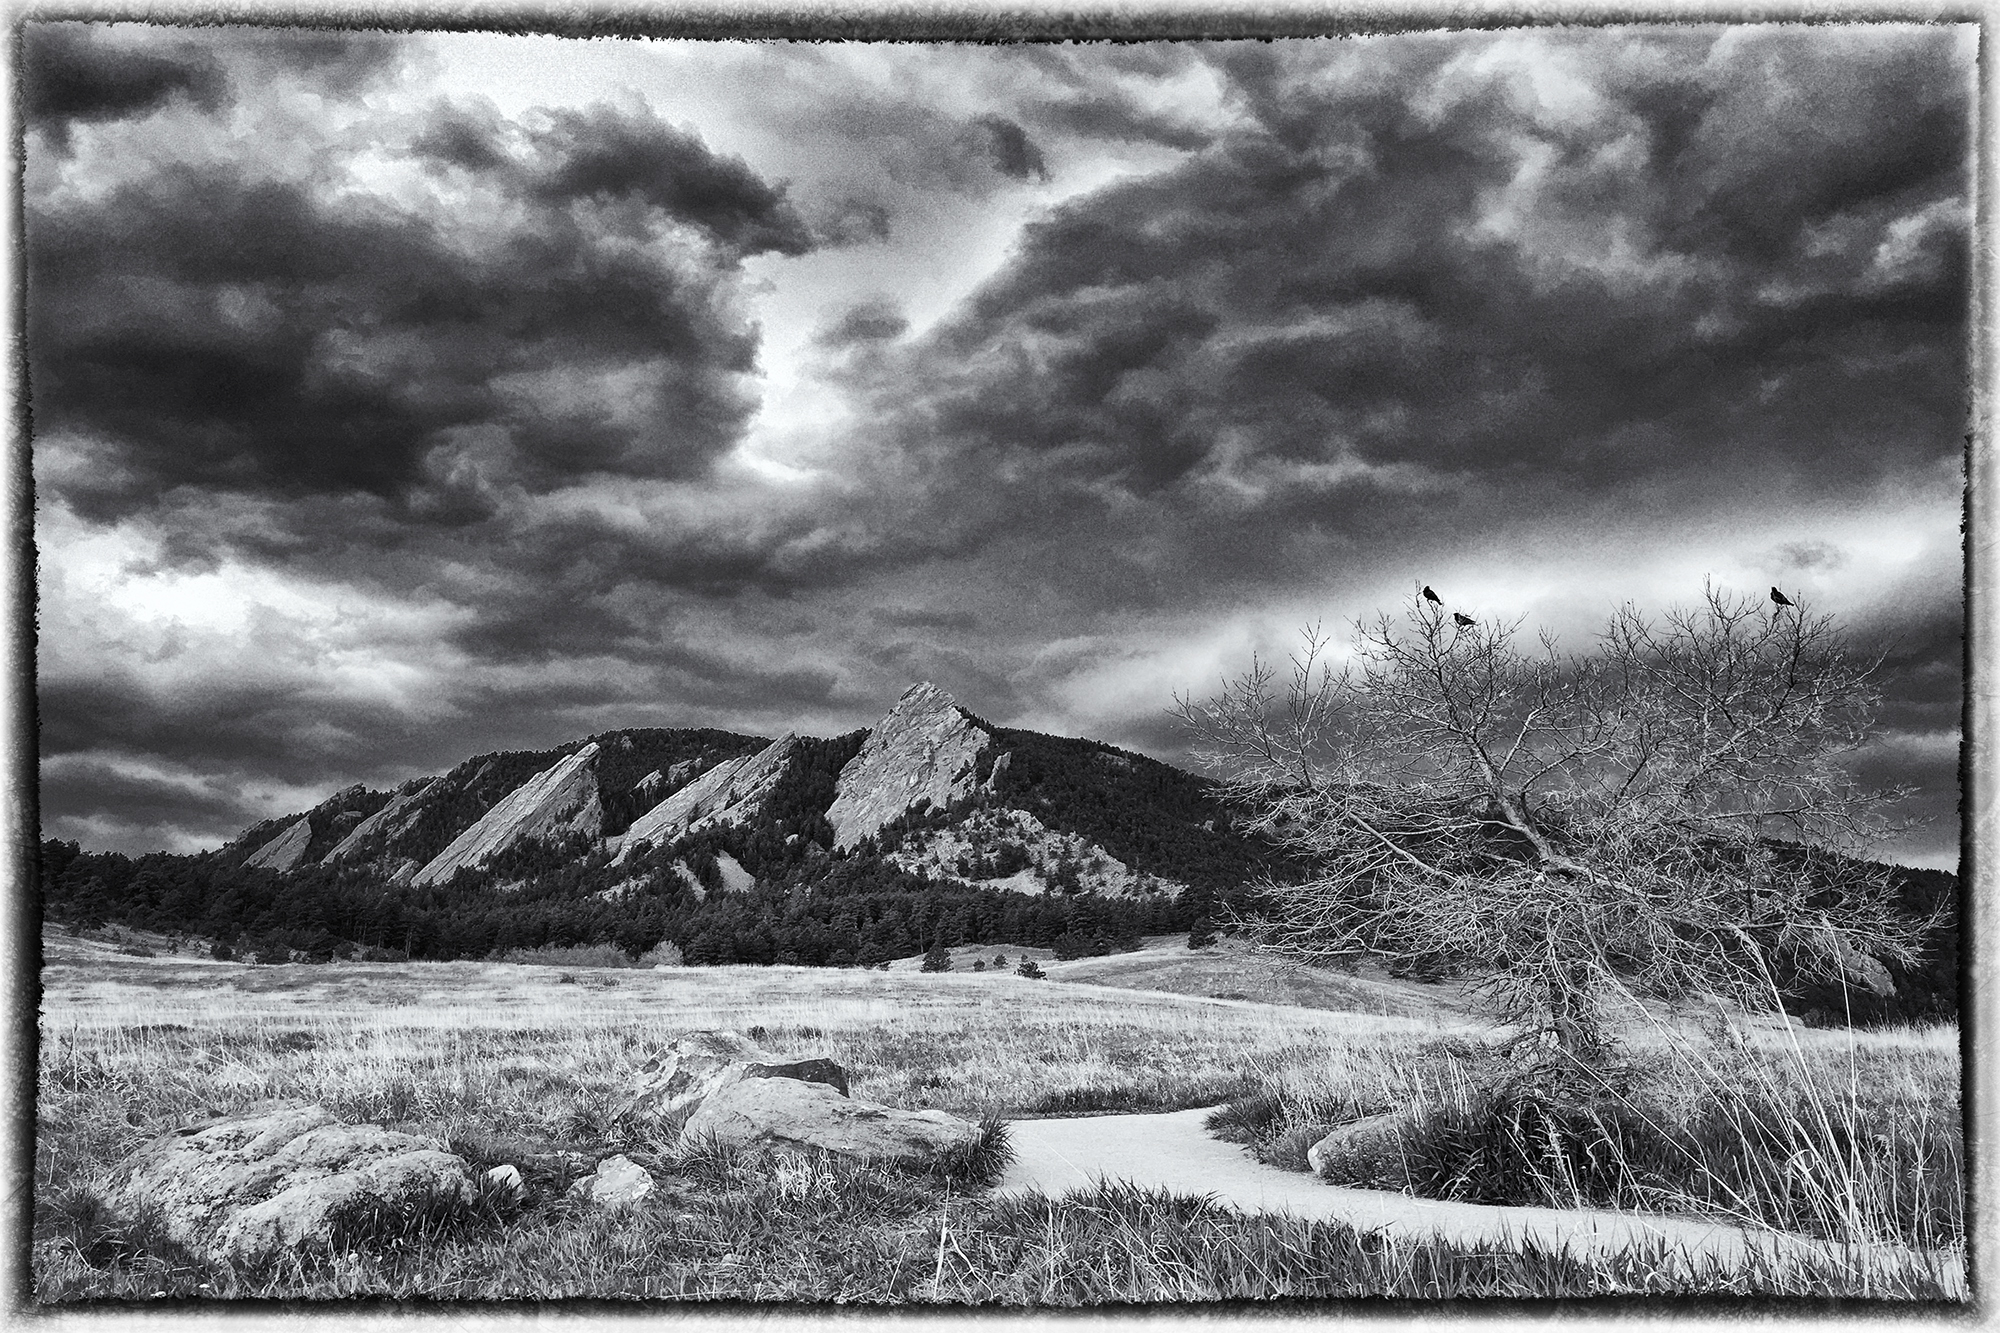 Ominous Flatirons. Boulder, Colorado, 2017